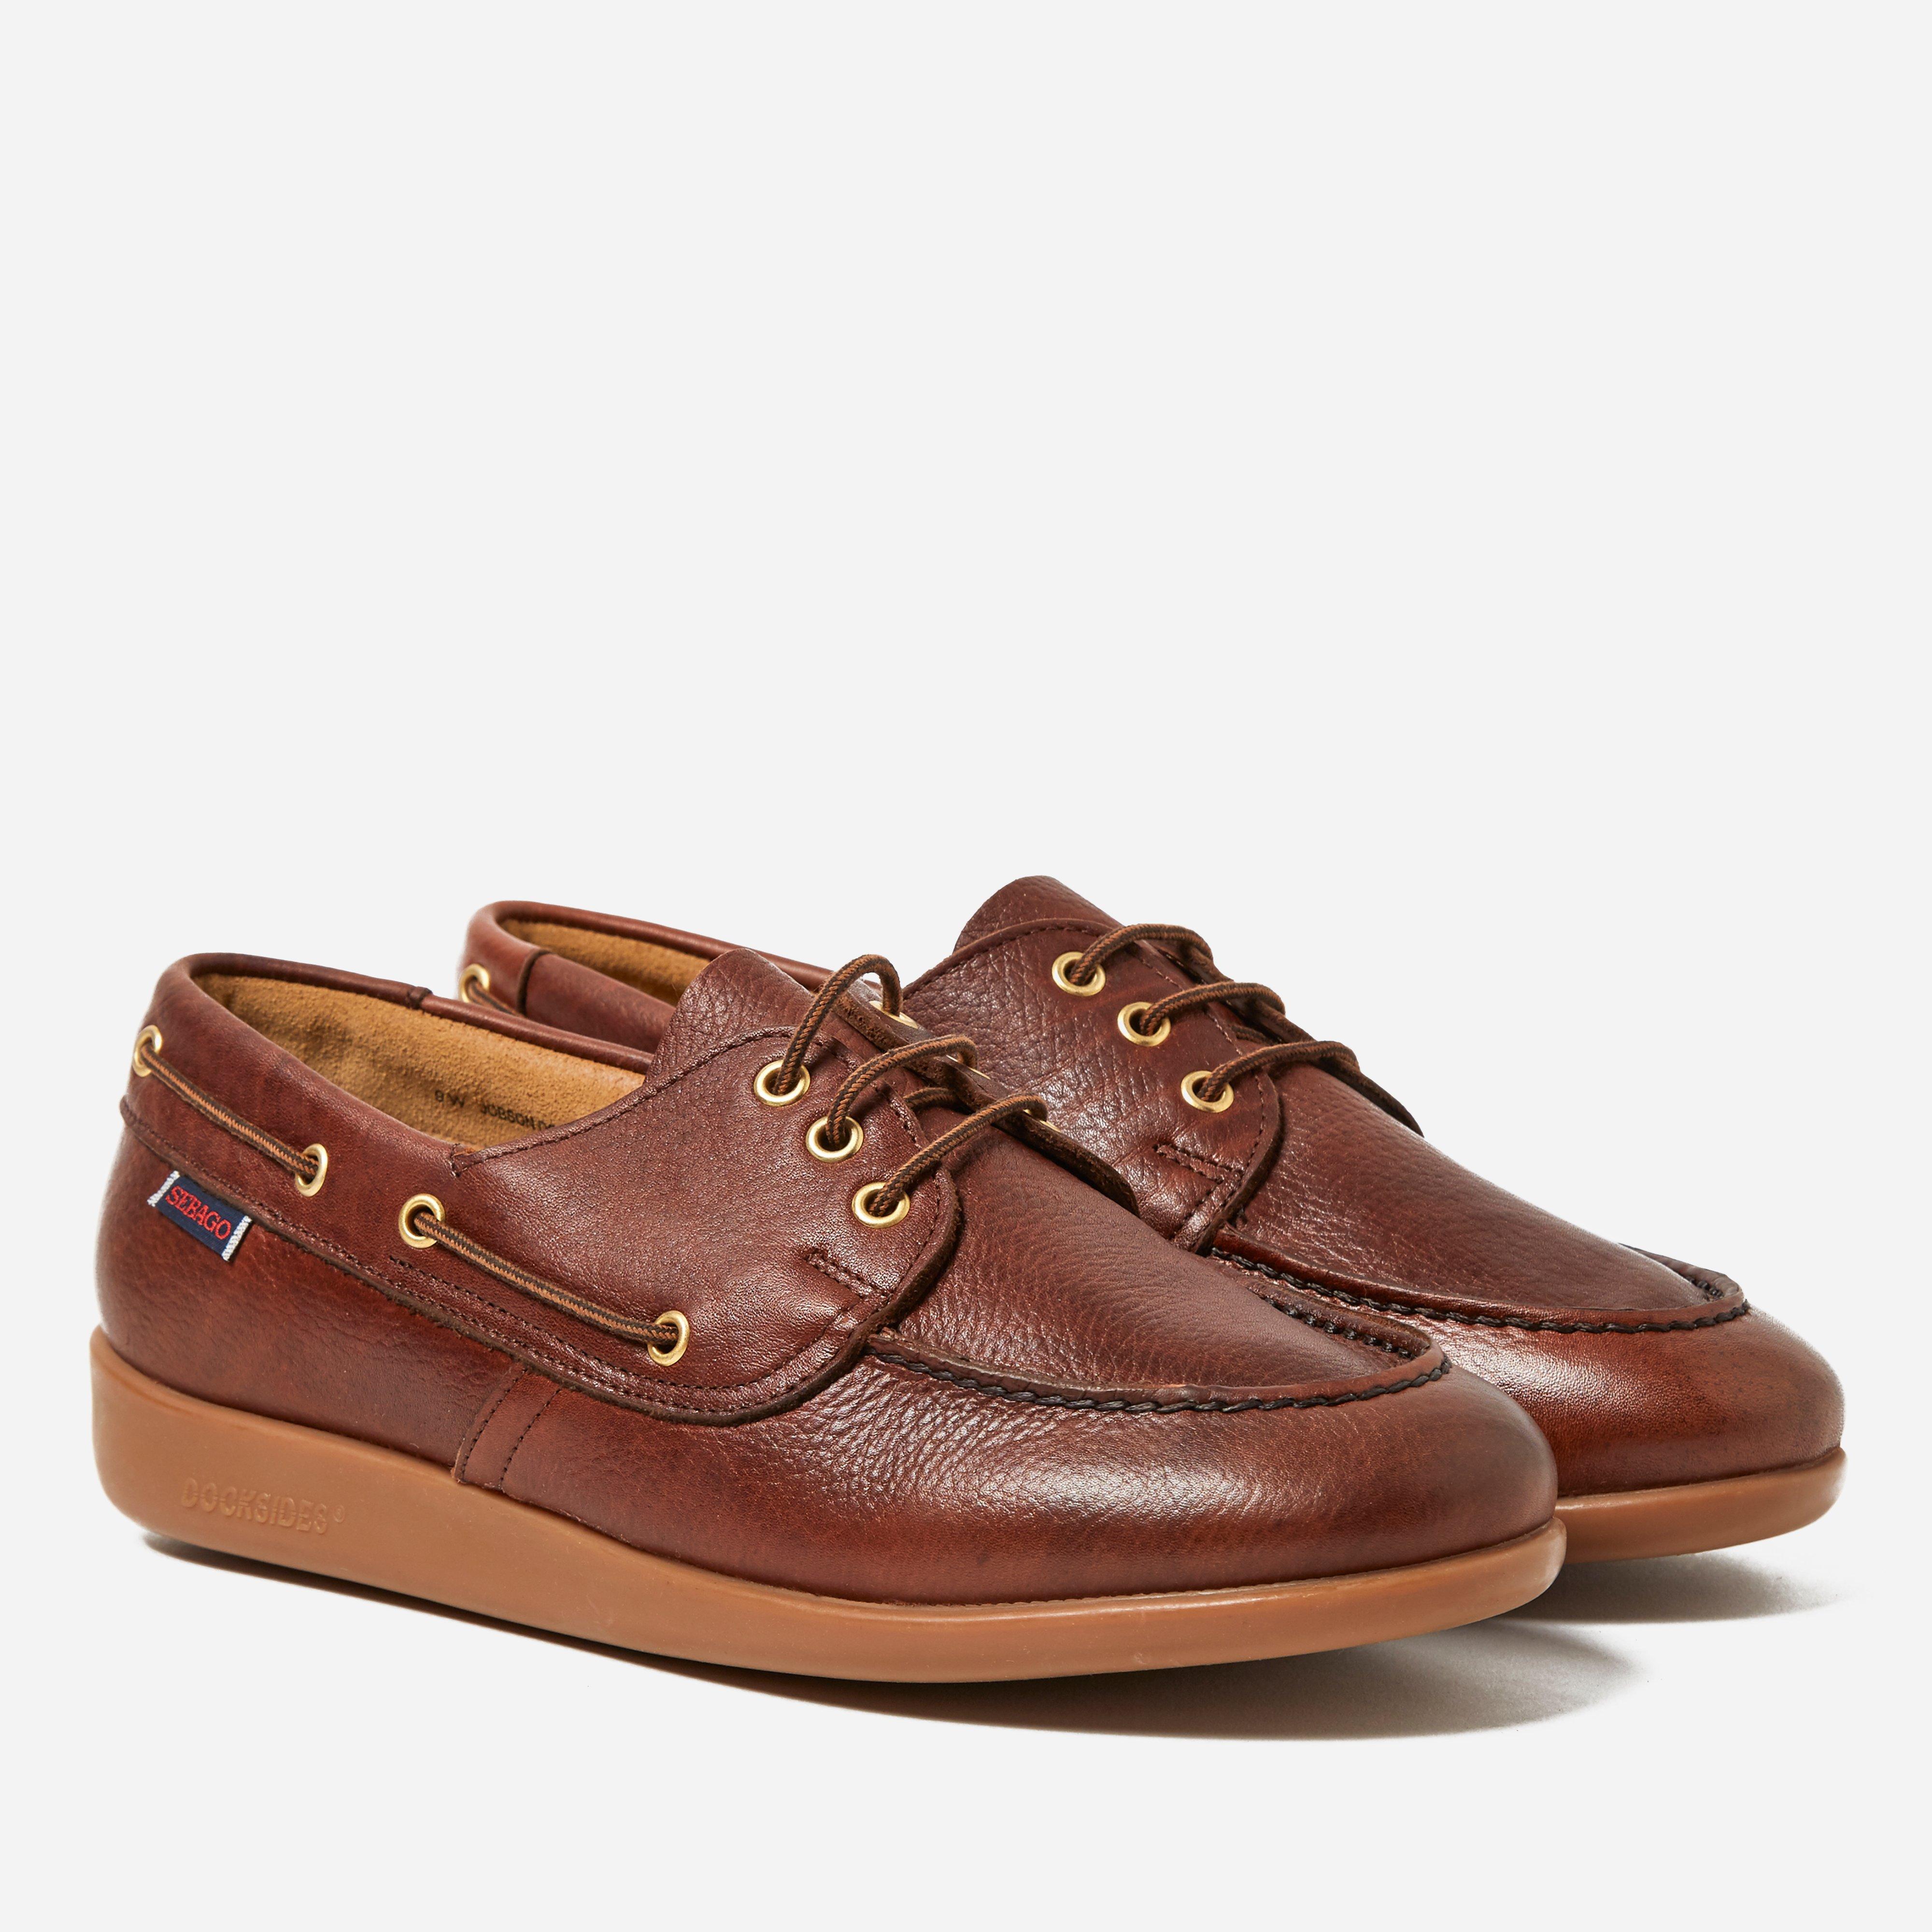 Sebago Jobson Docksides Leather